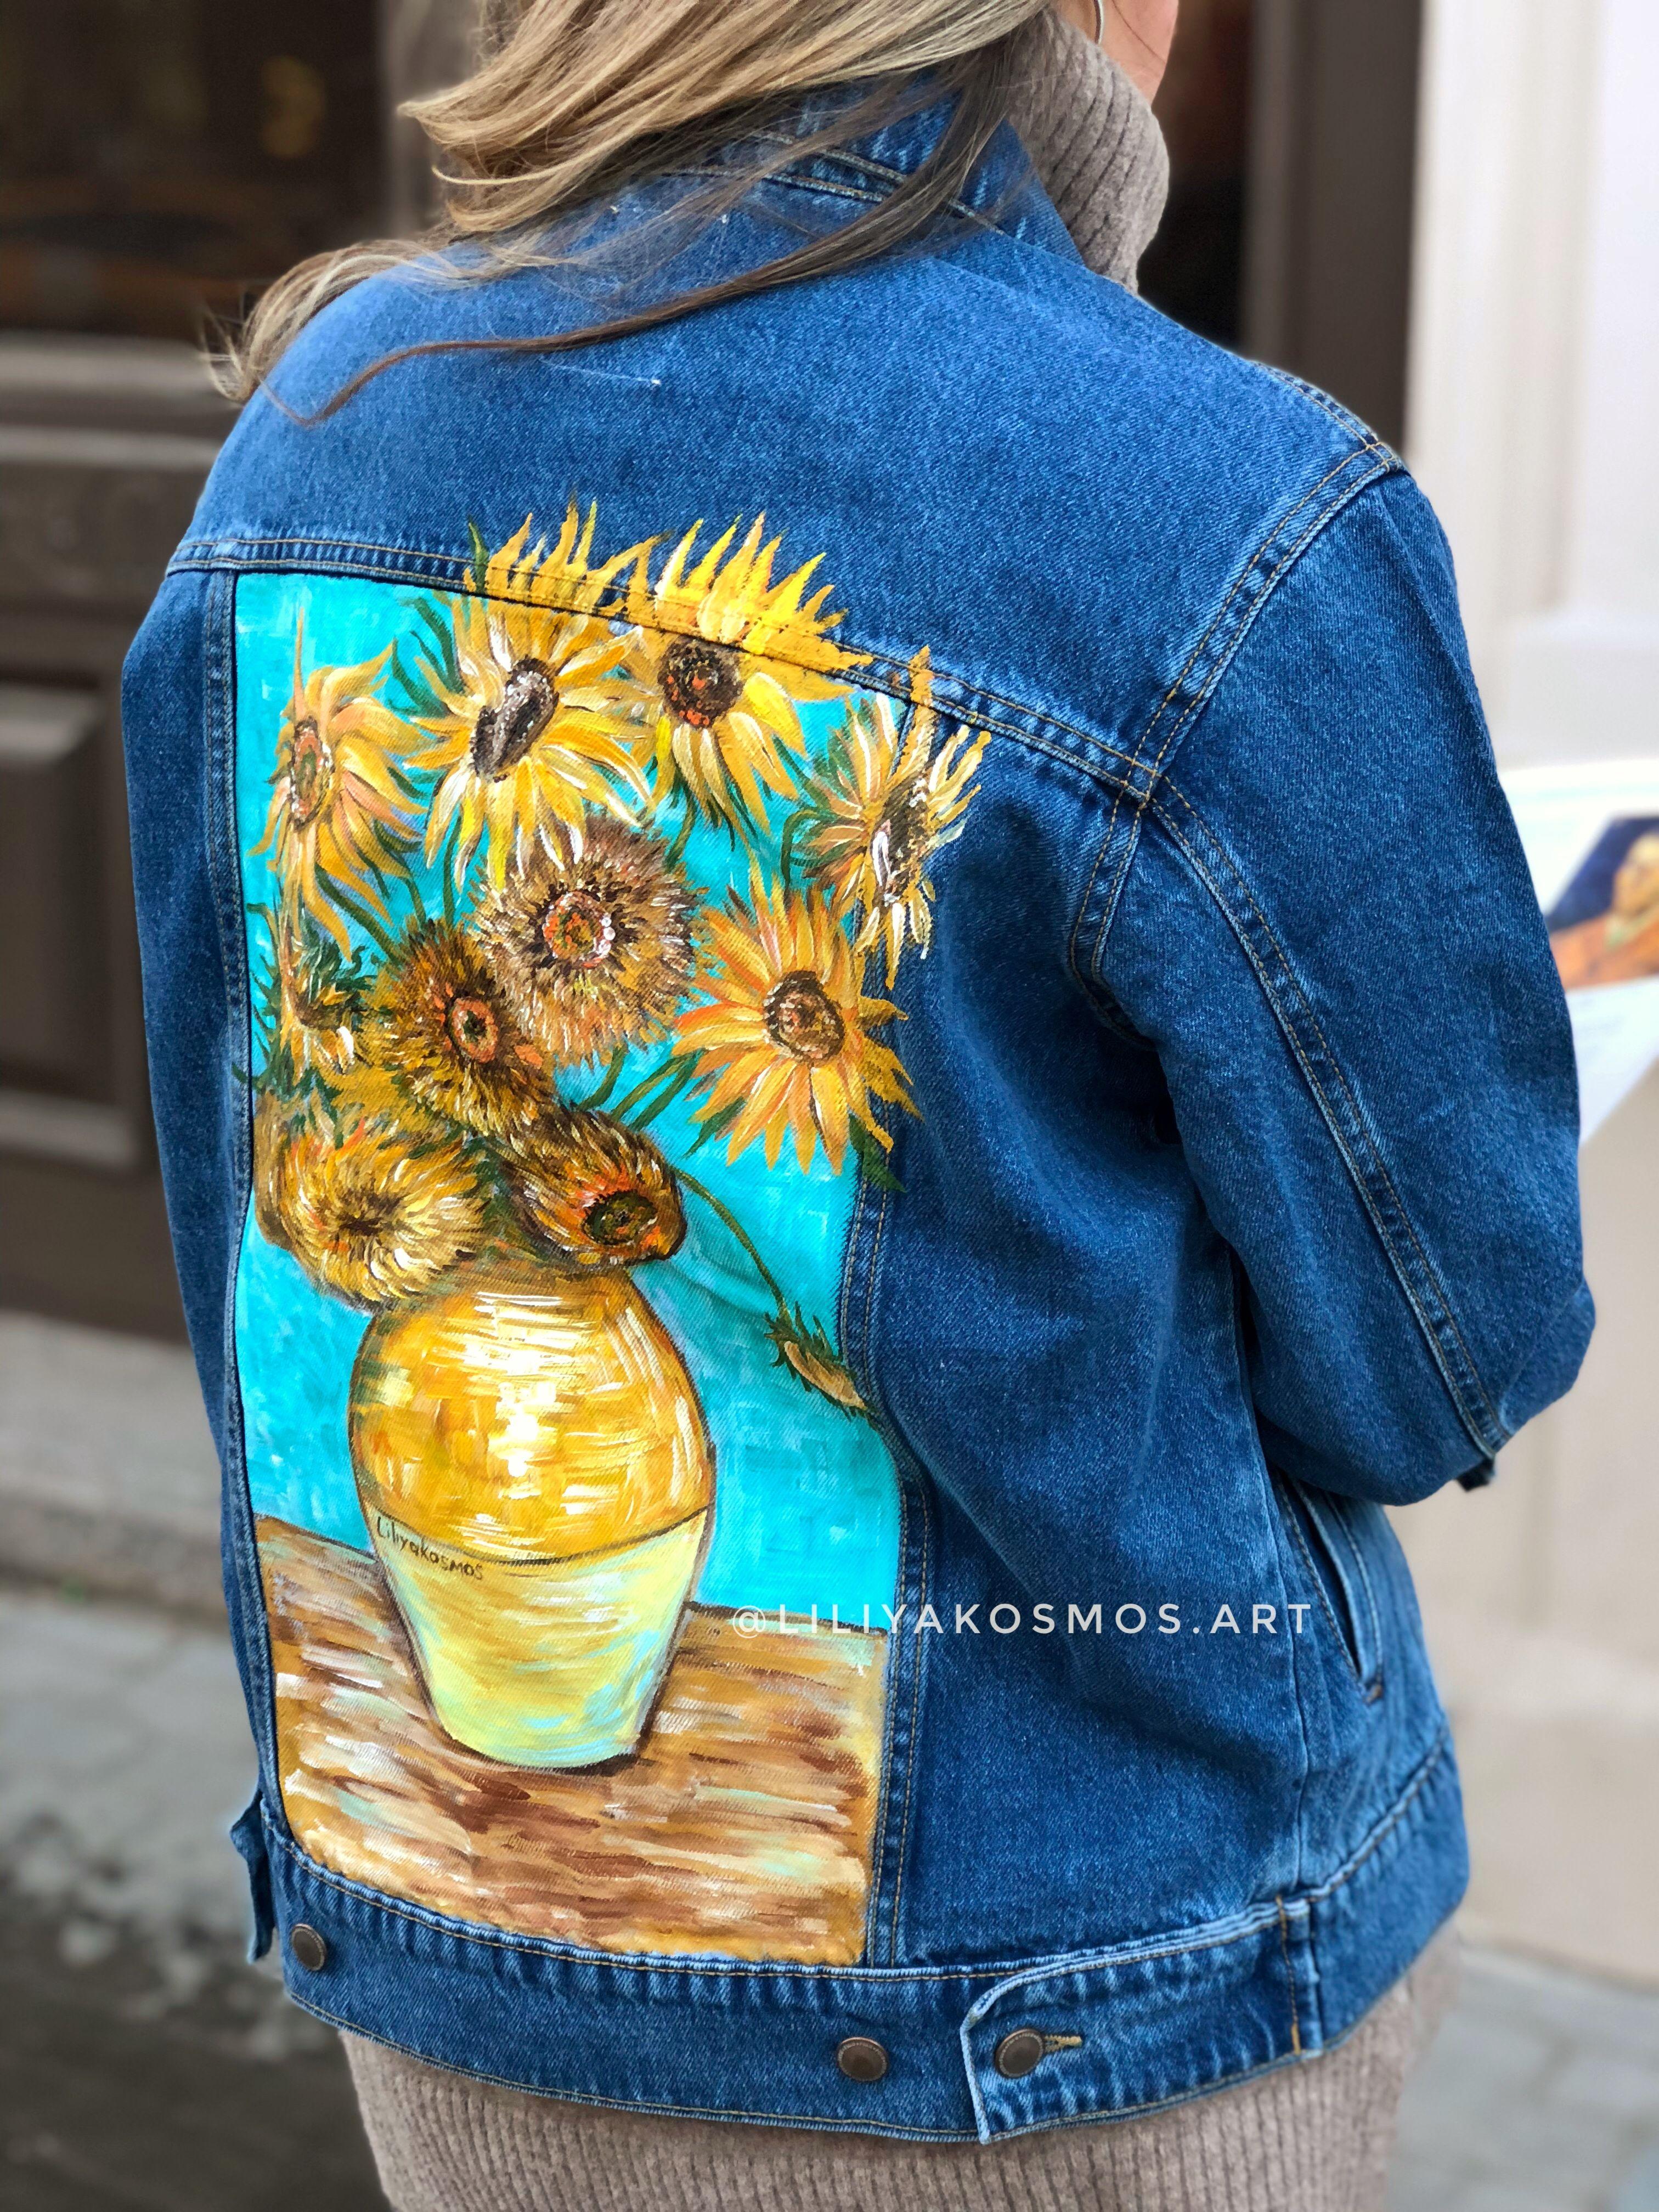 Painted Custom Van Gogh Sunflowers Denim Jacket Price Only Etsy Hand Painted Denim Jacket Custom Denim Jacket Custom Denim [ 4032 x 3024 Pixel ]